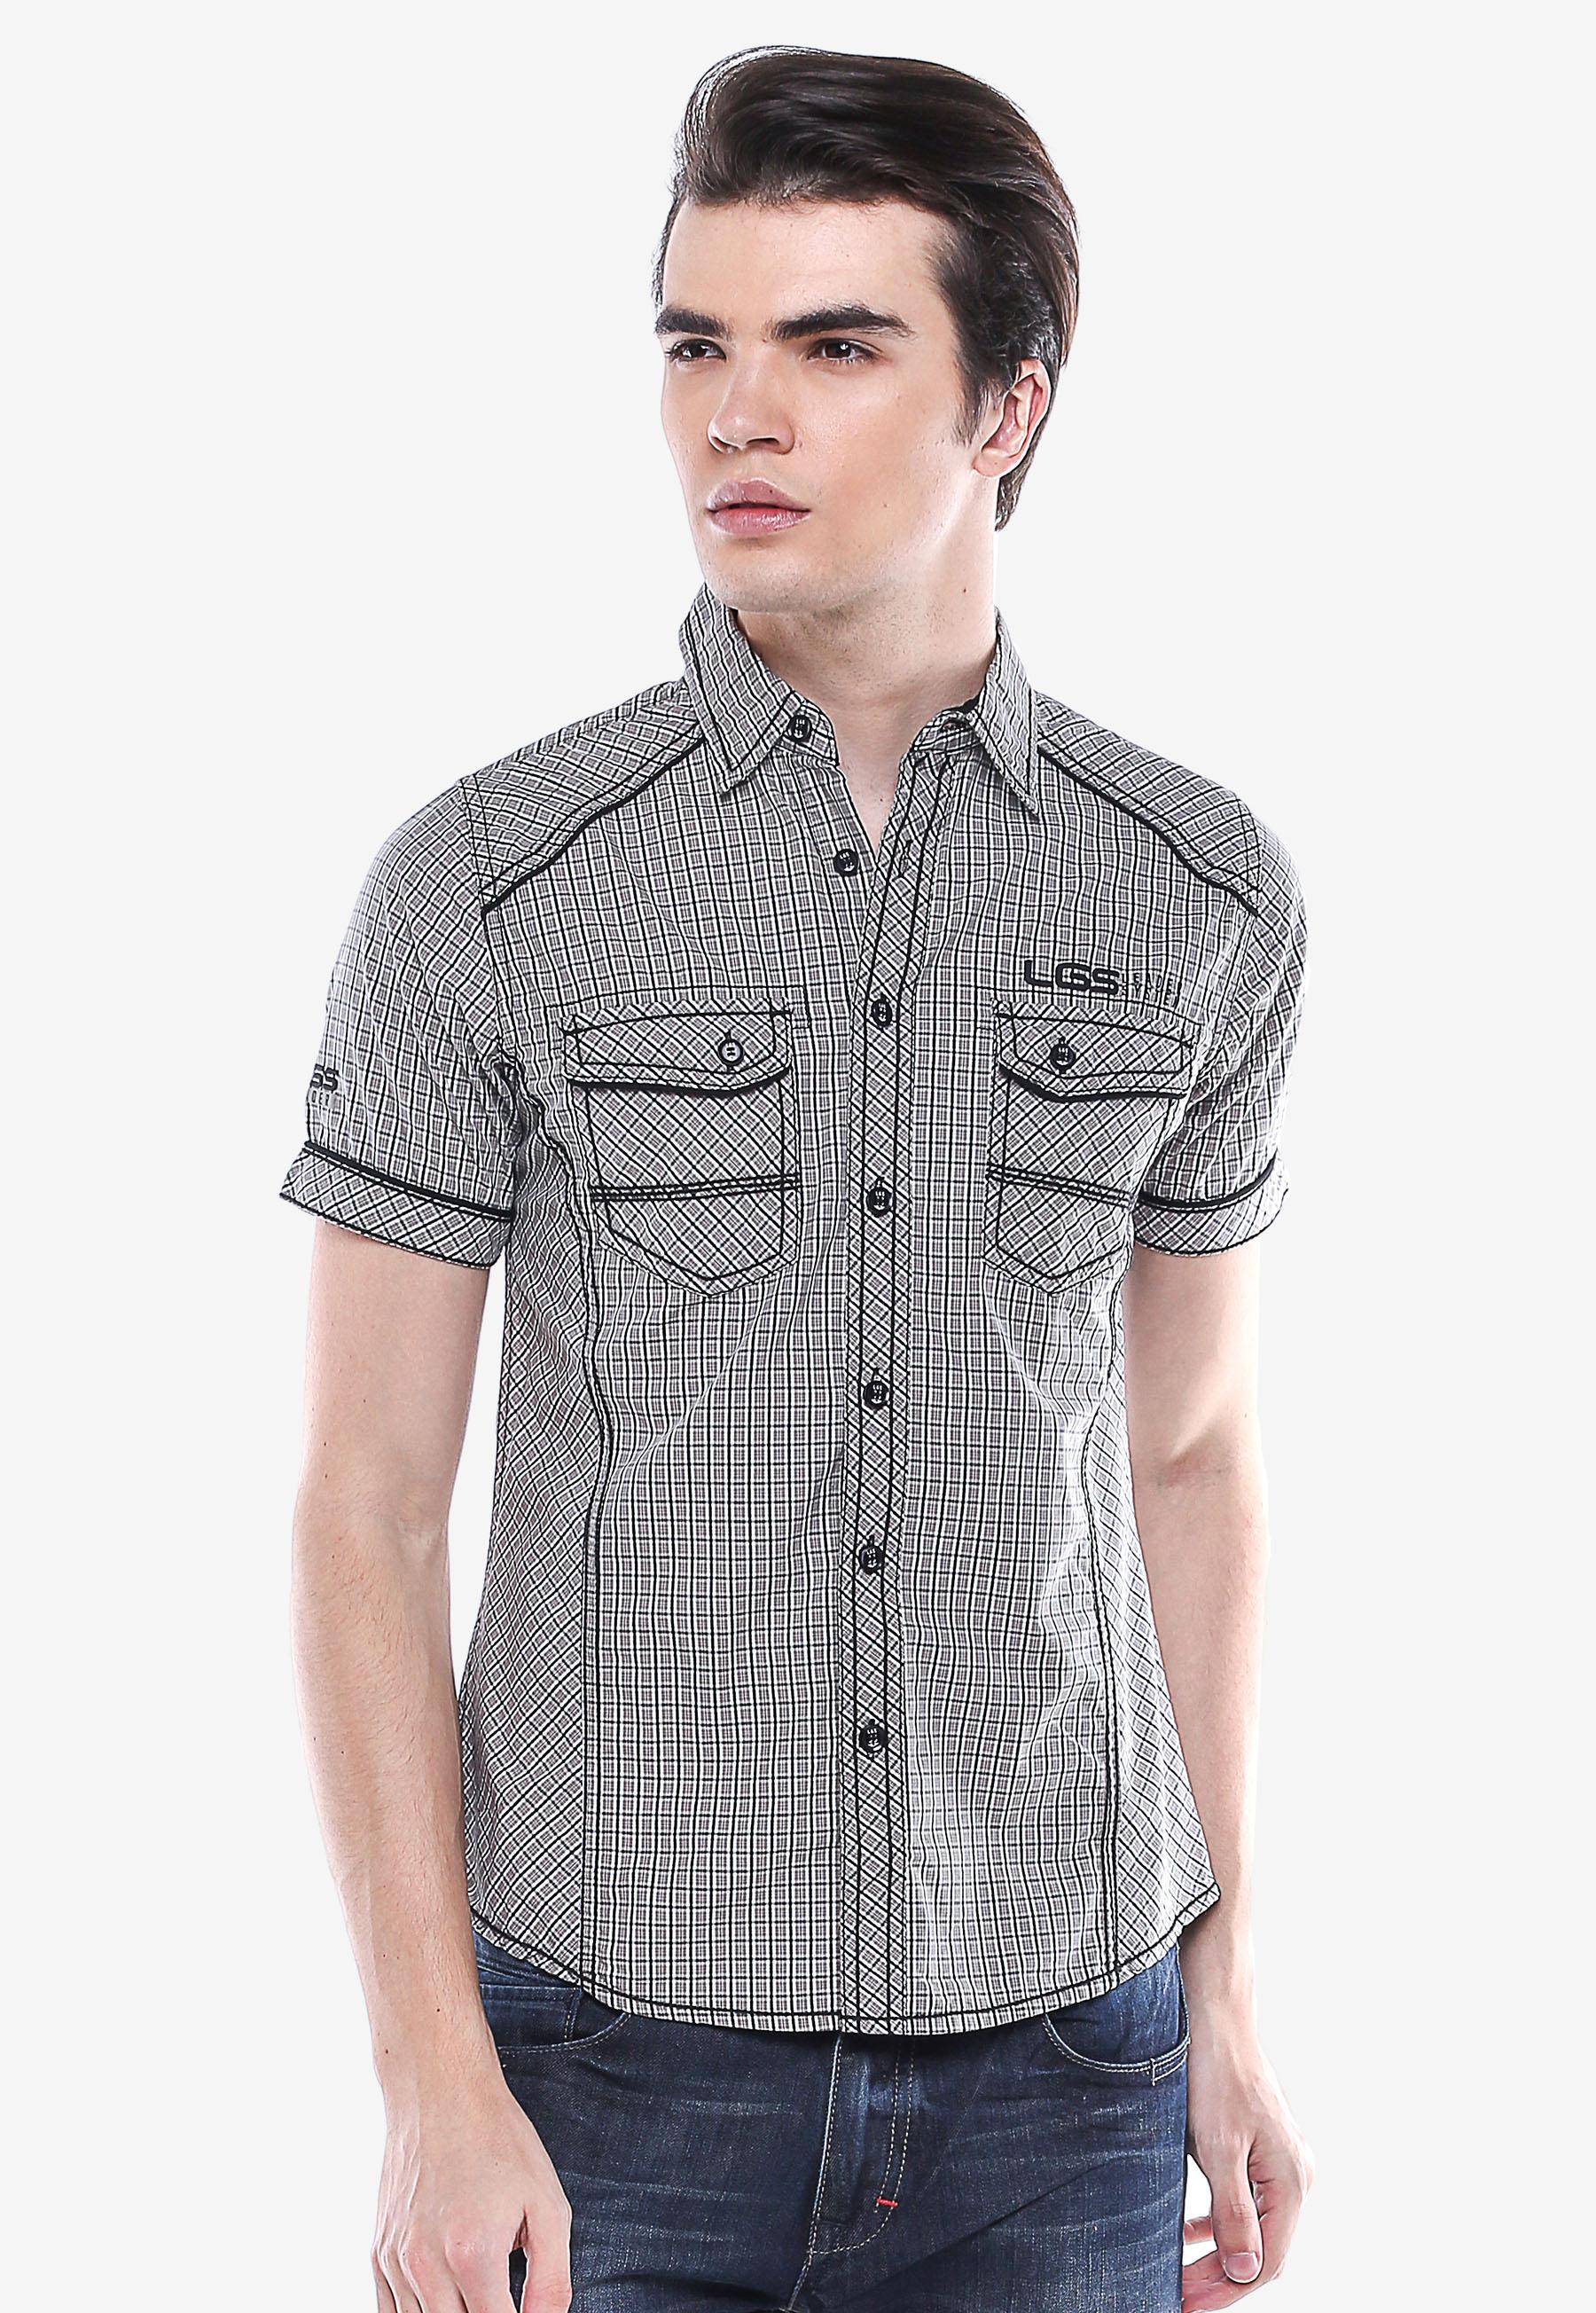 Lgsgeneration Shop Line Lgs Slim Fit Kaos Polo Salur Hitam Putih Xl Kemeja Fashion Abu Model Gingham